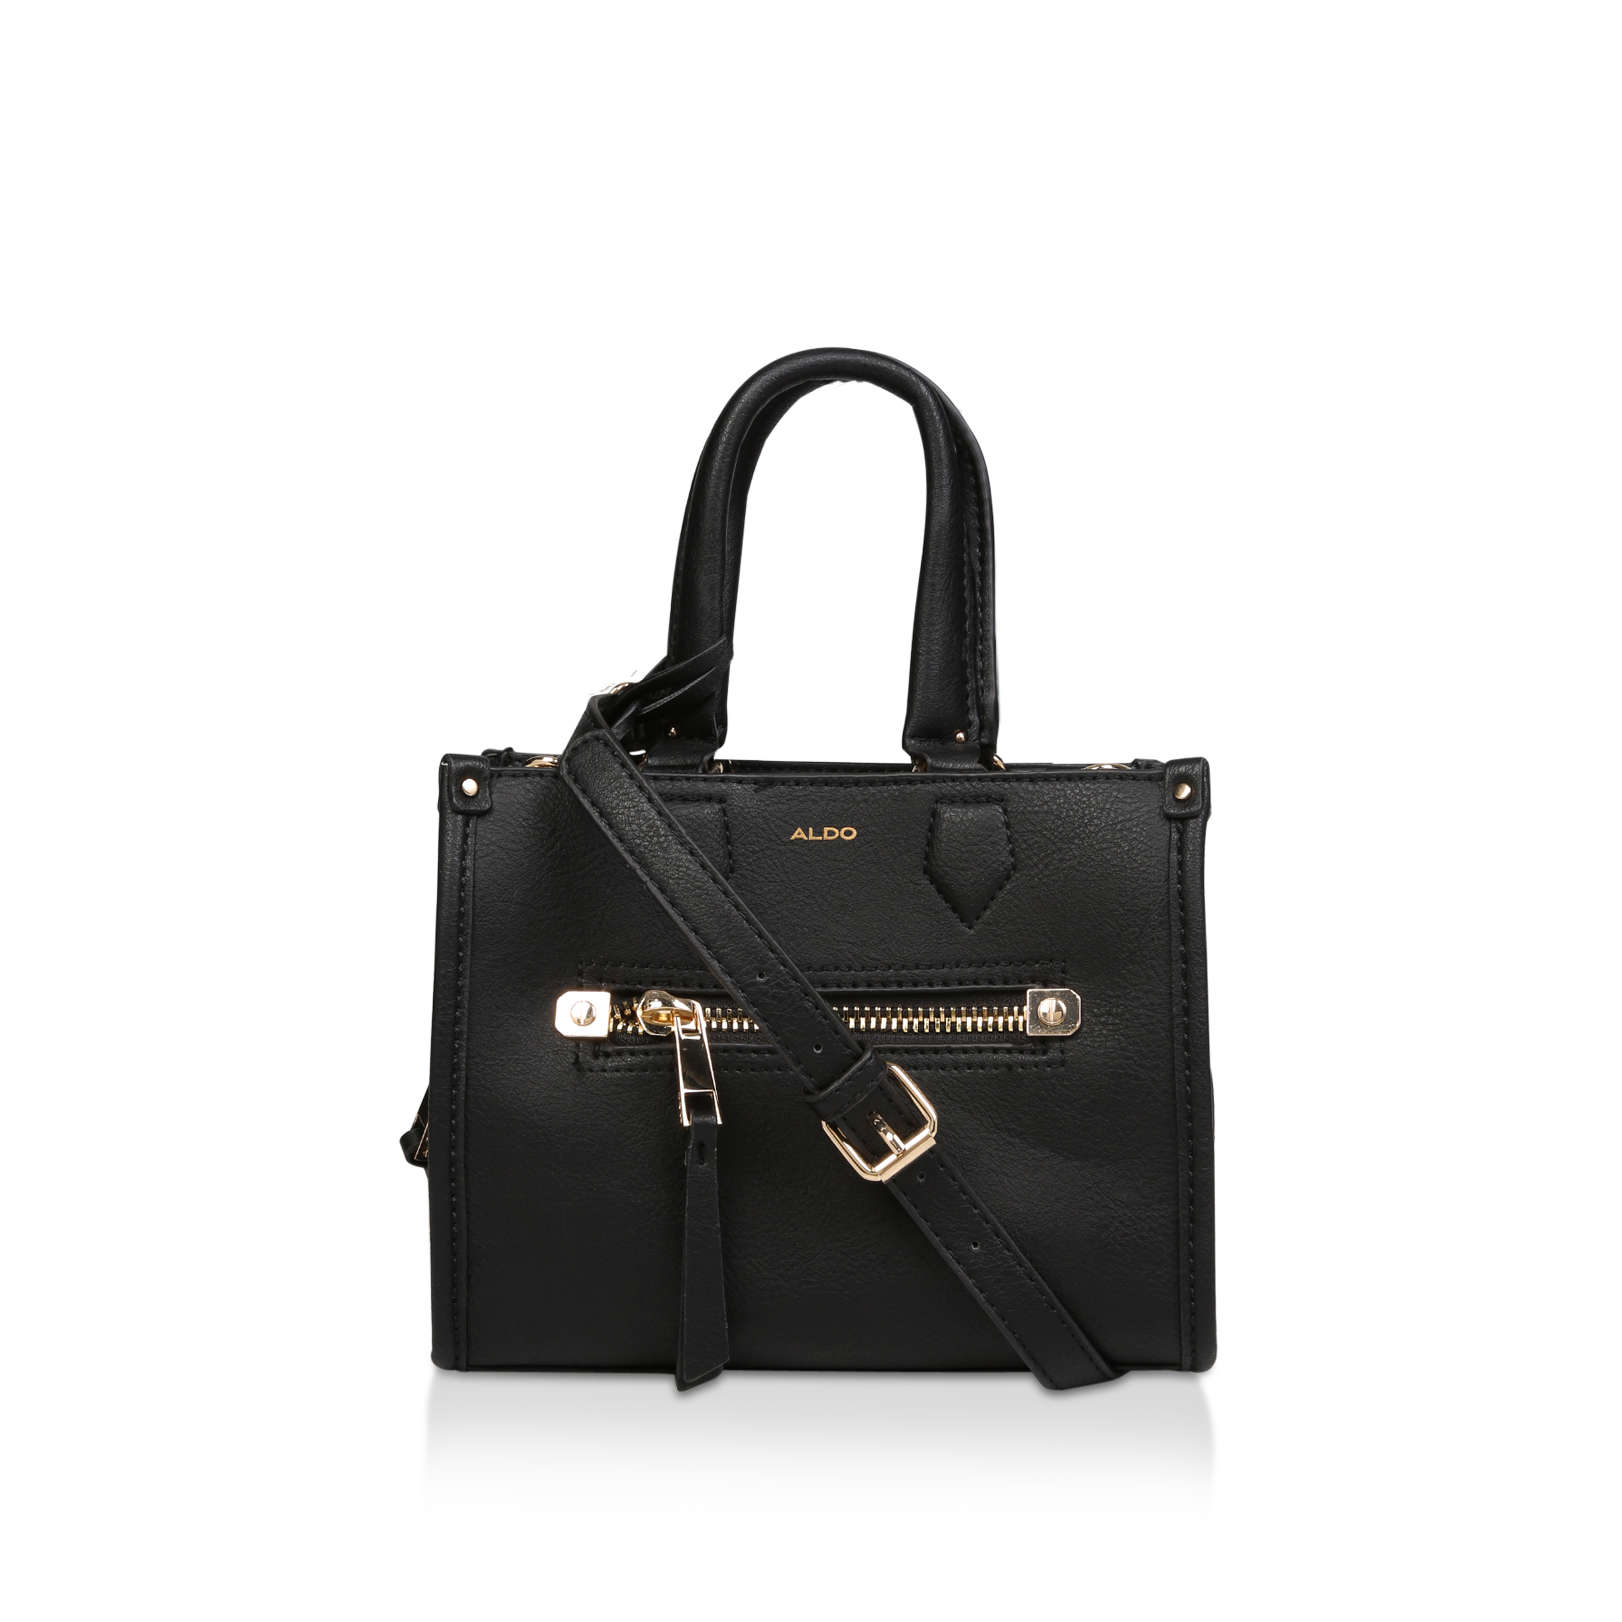 9f8e9444c02 ZAODE Zaode Handbags Aldo Black by ALDO